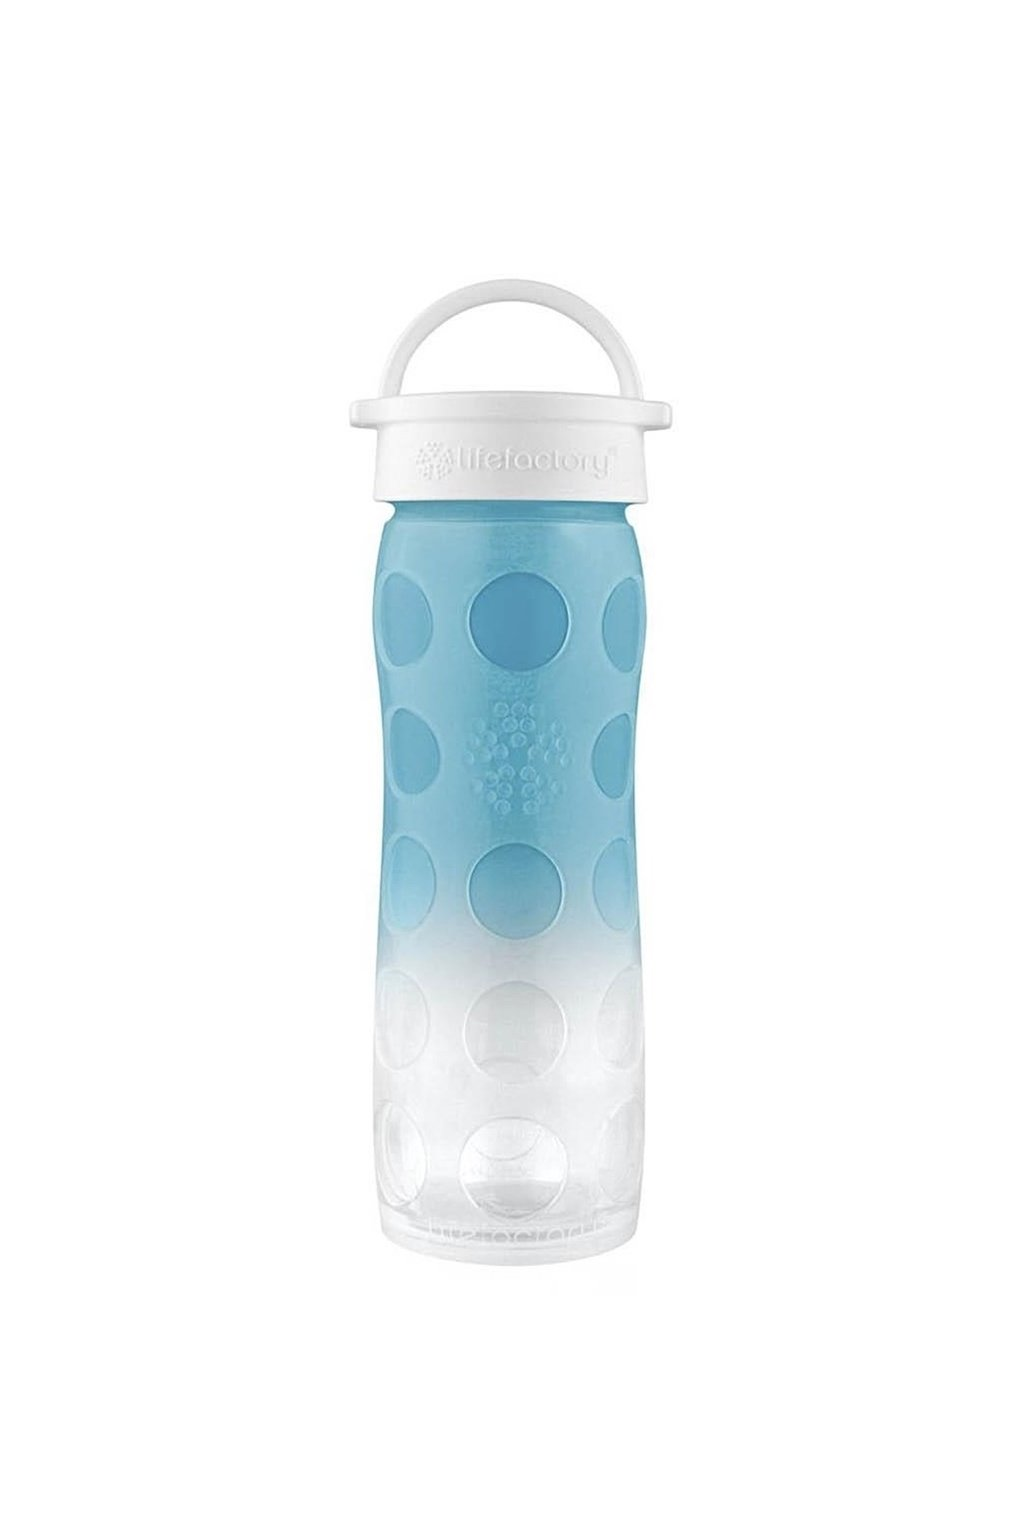 Sklenena lahev pro holky Lifefactory 475 ml Ultramarine Ombre